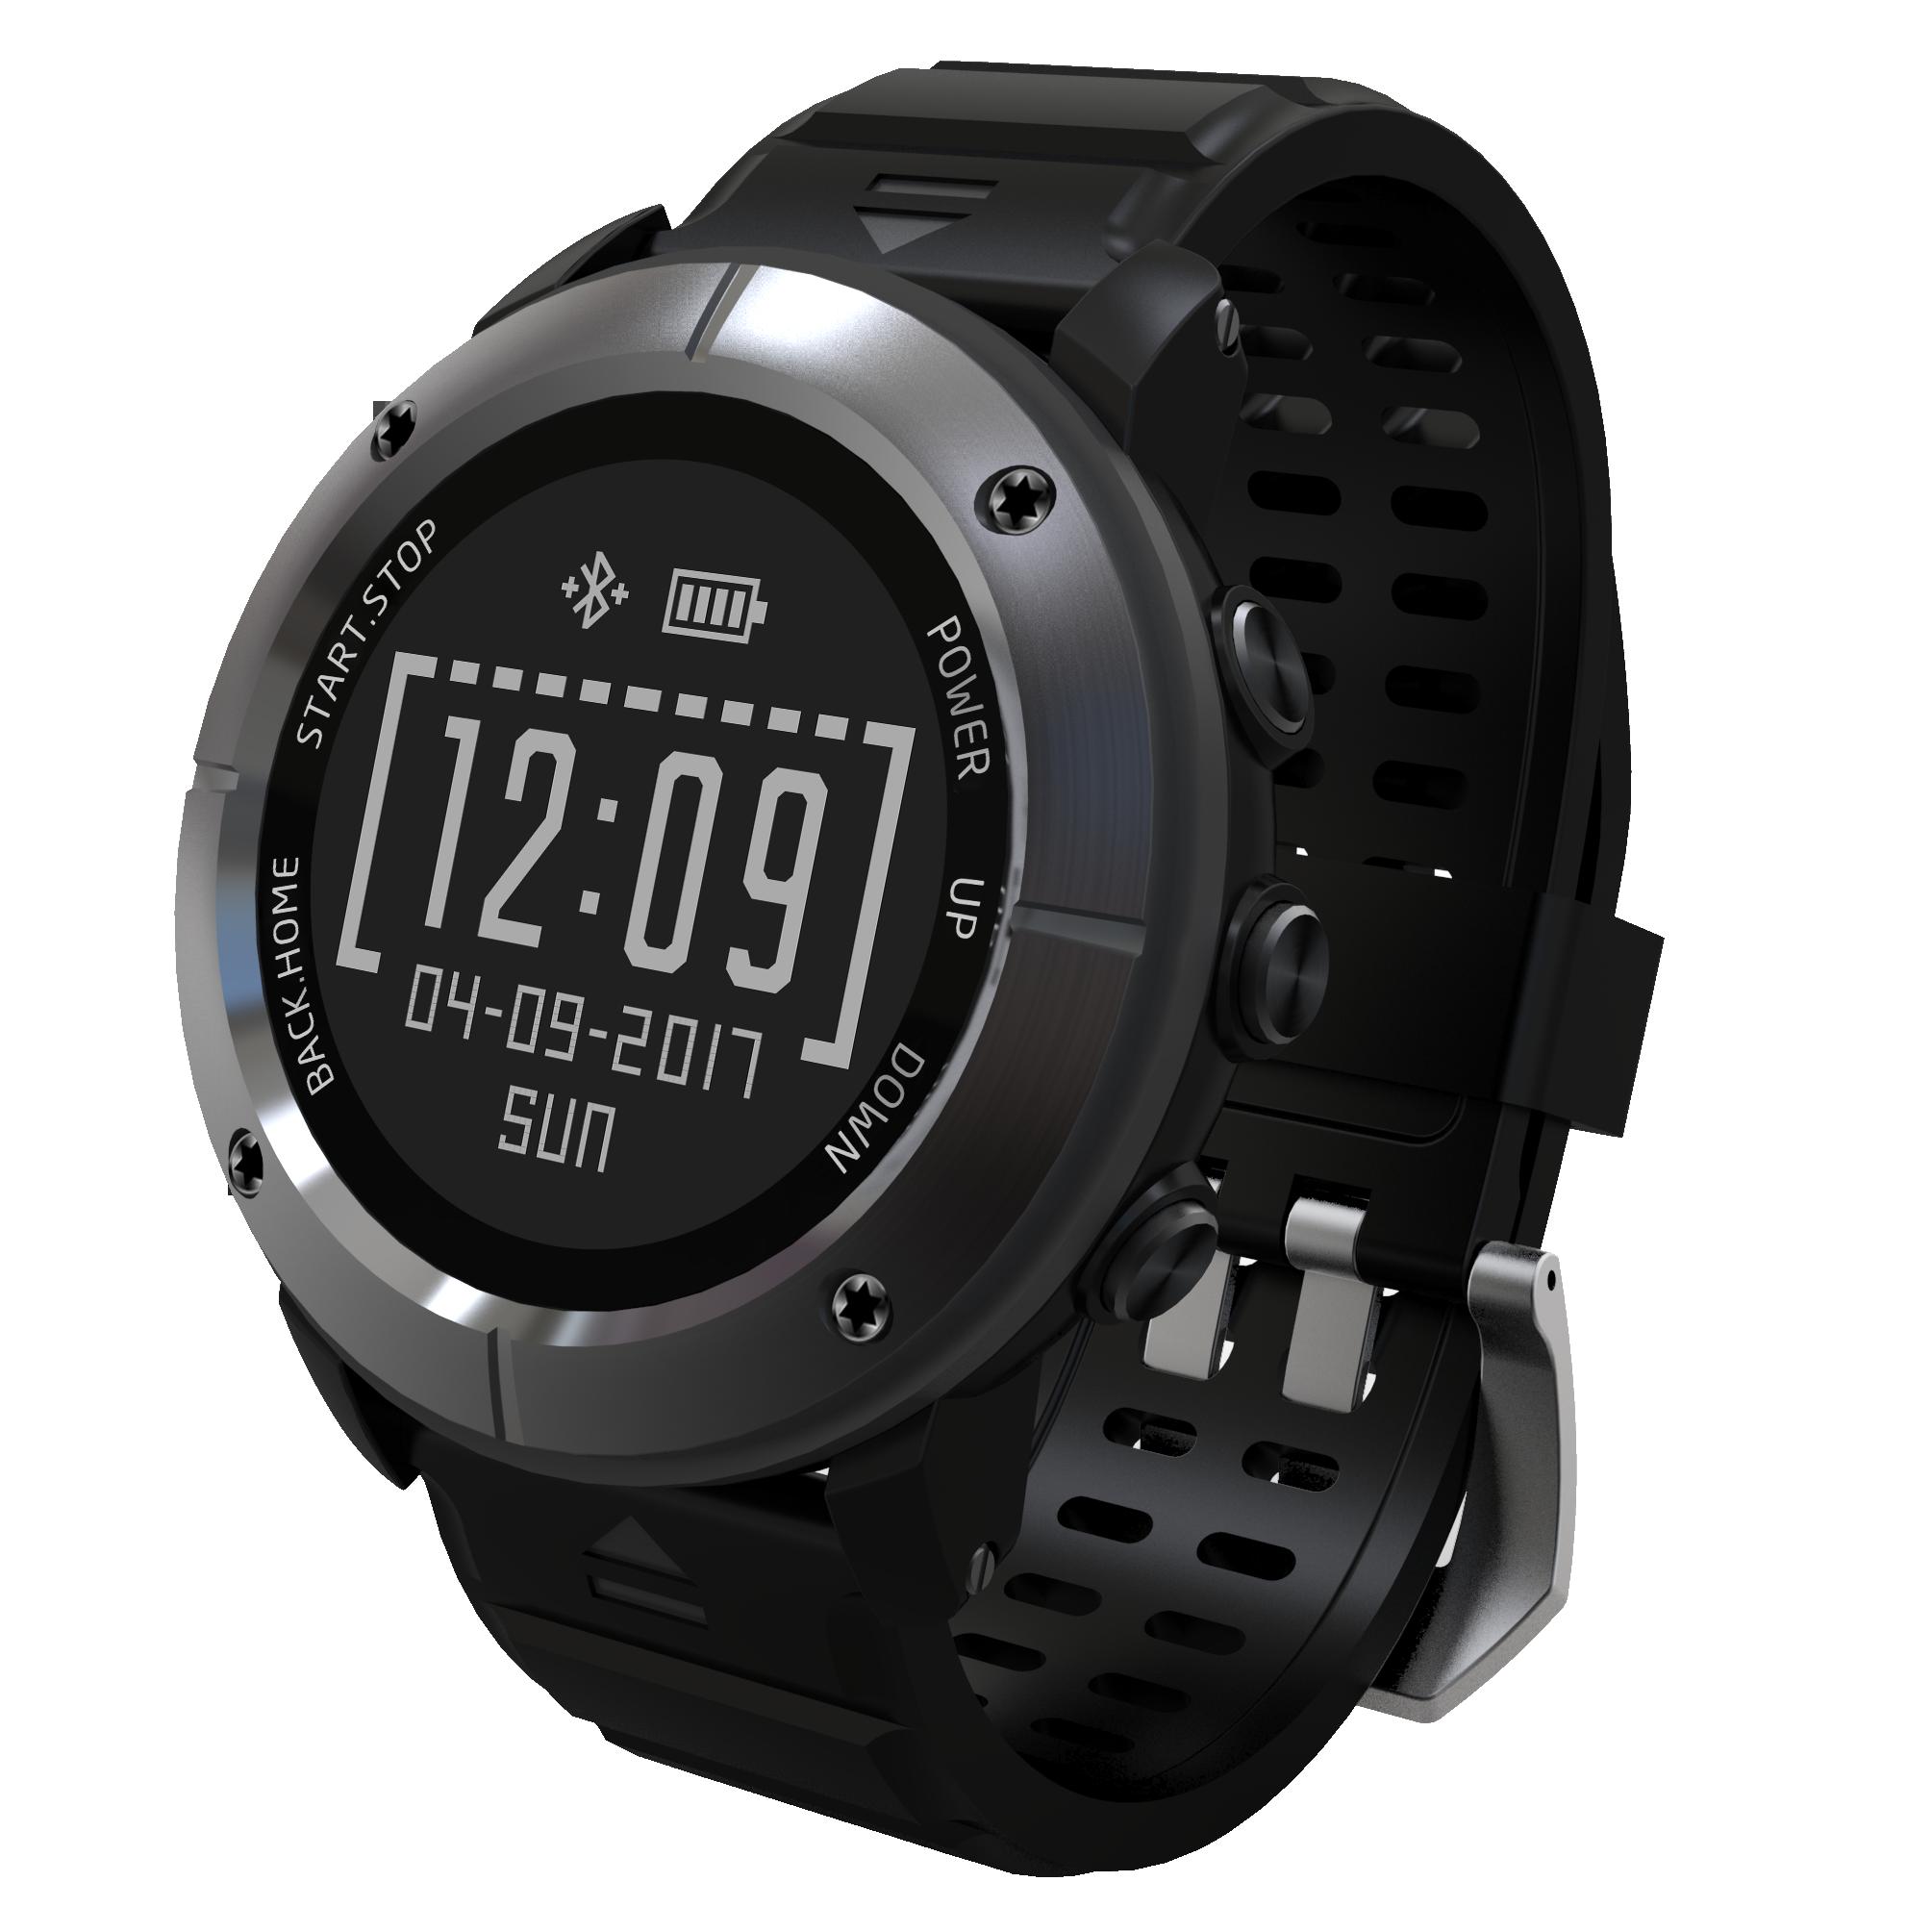 Uwear户外运动多功能北斗GPS心率跑步轨迹指南针气压海拔游泳手表